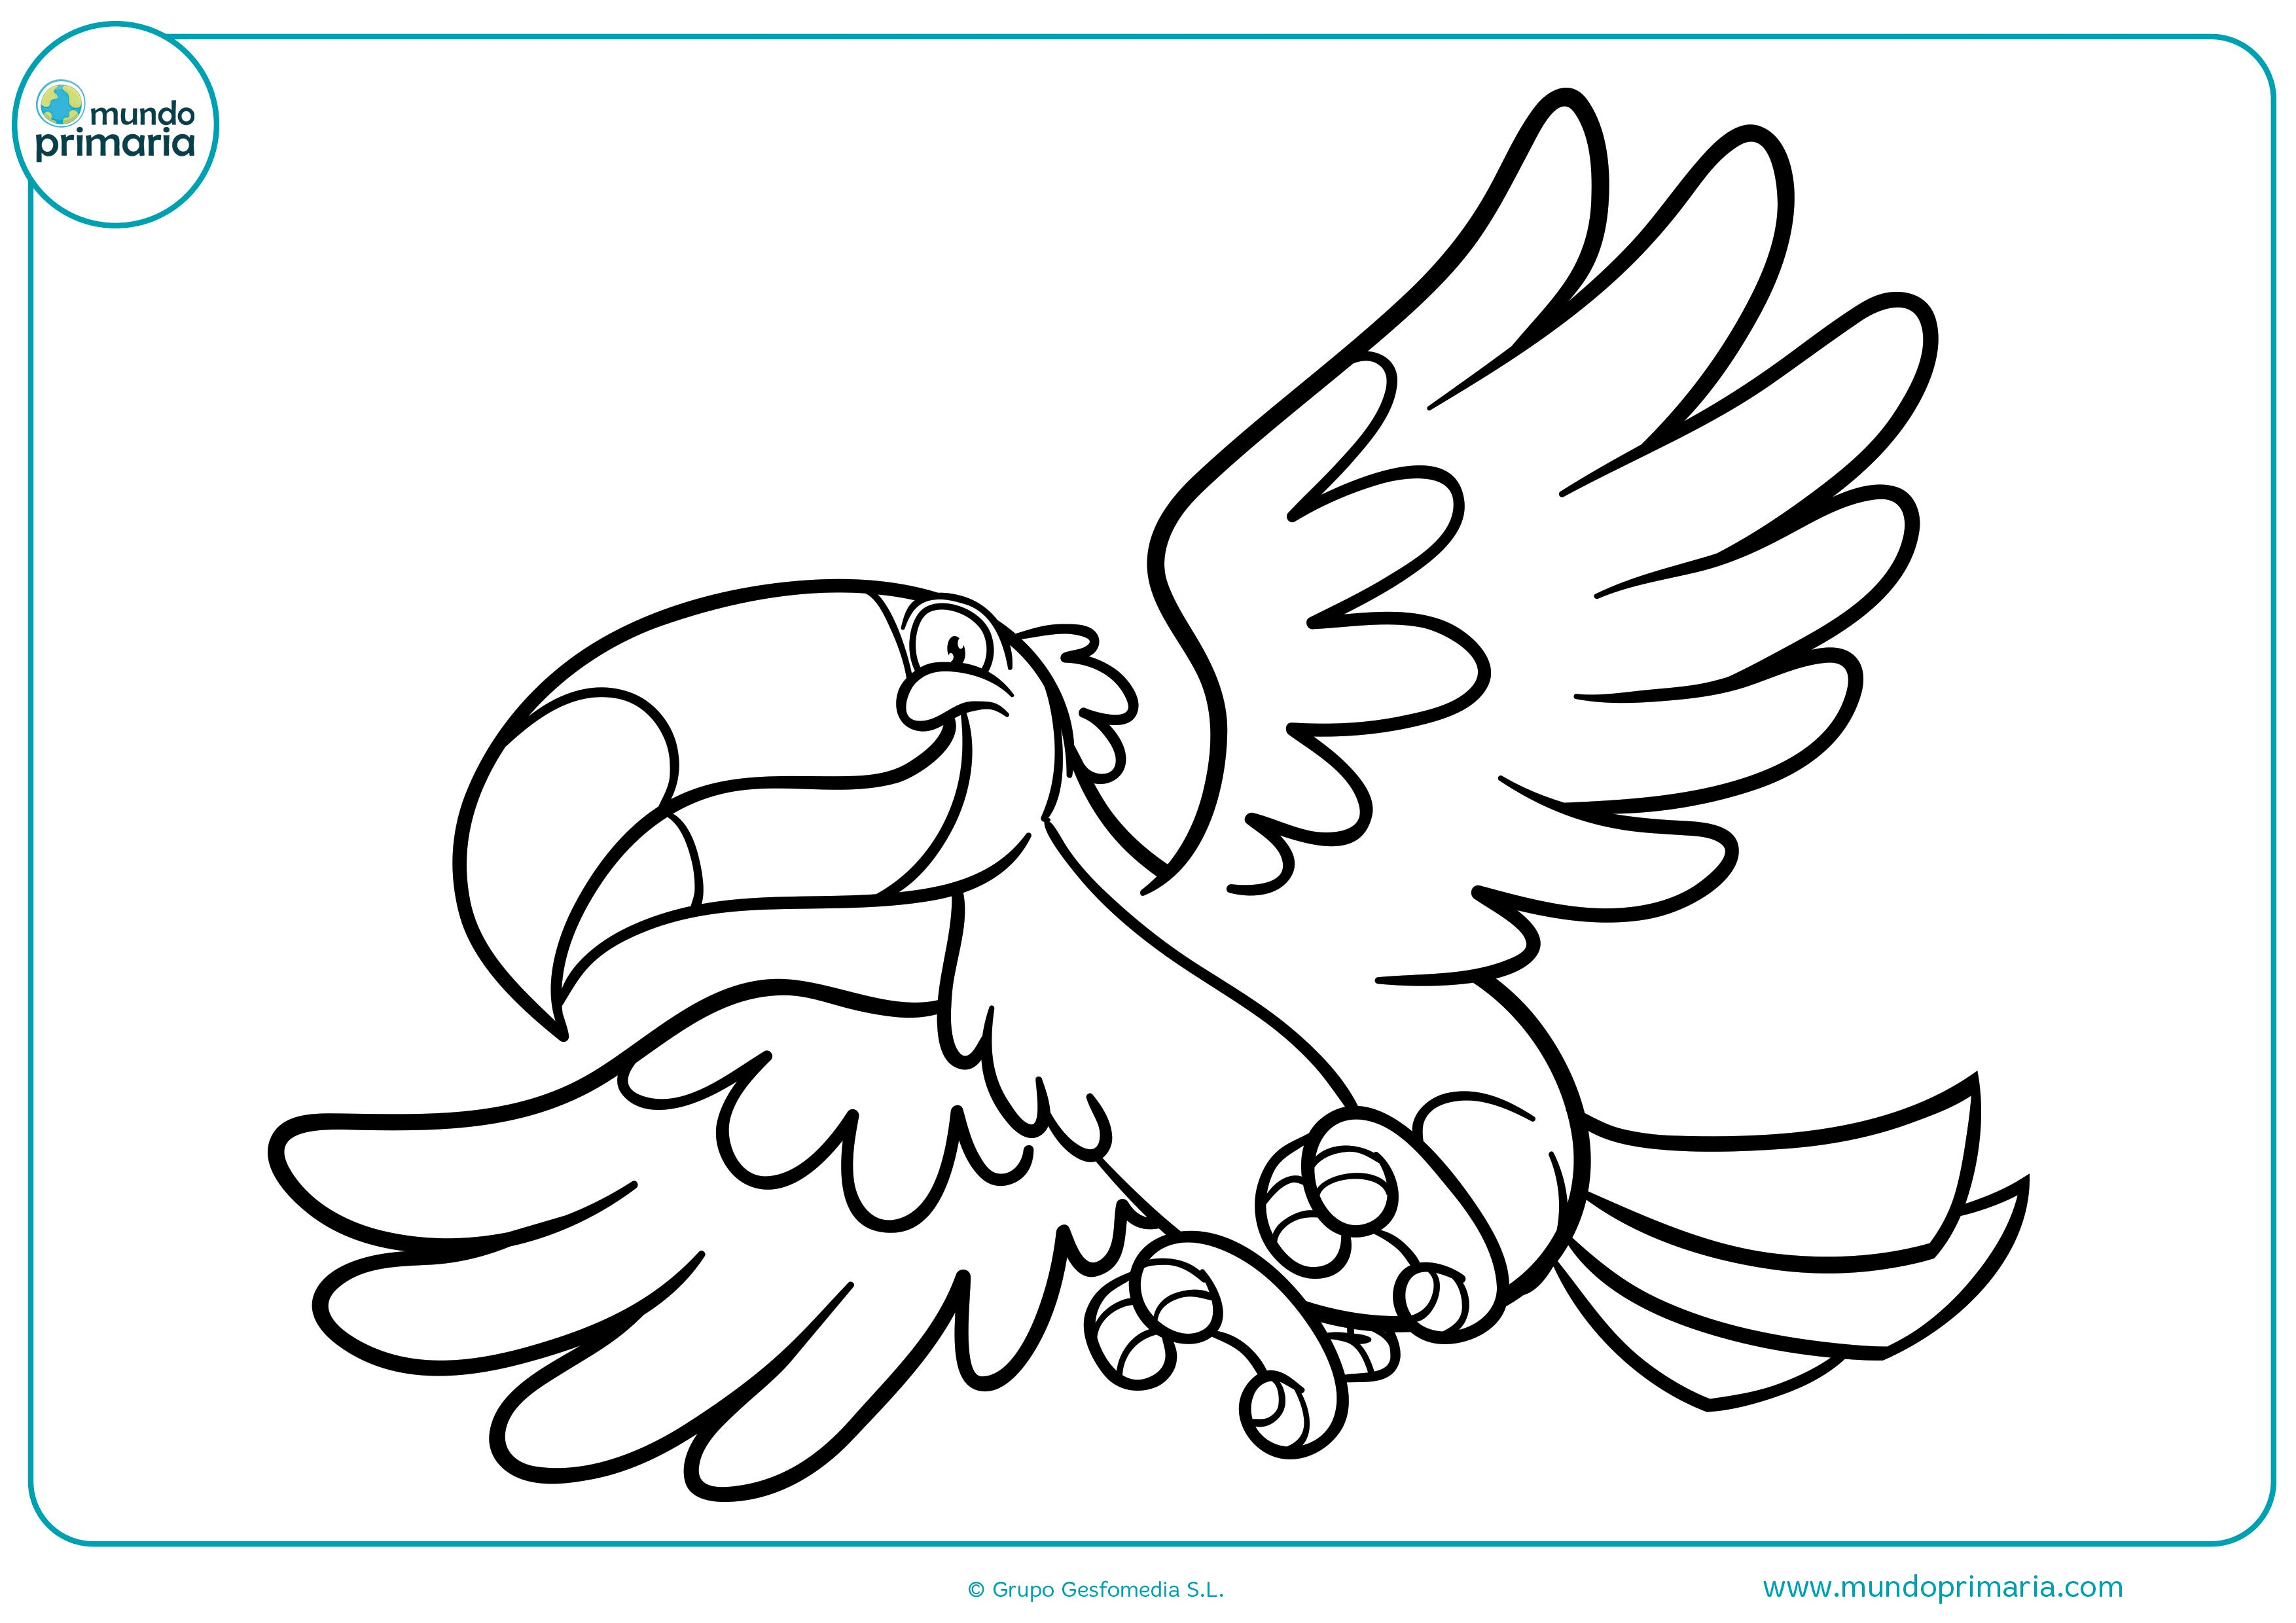 Dibujos De Aves Para Colorear Mundo Primaria